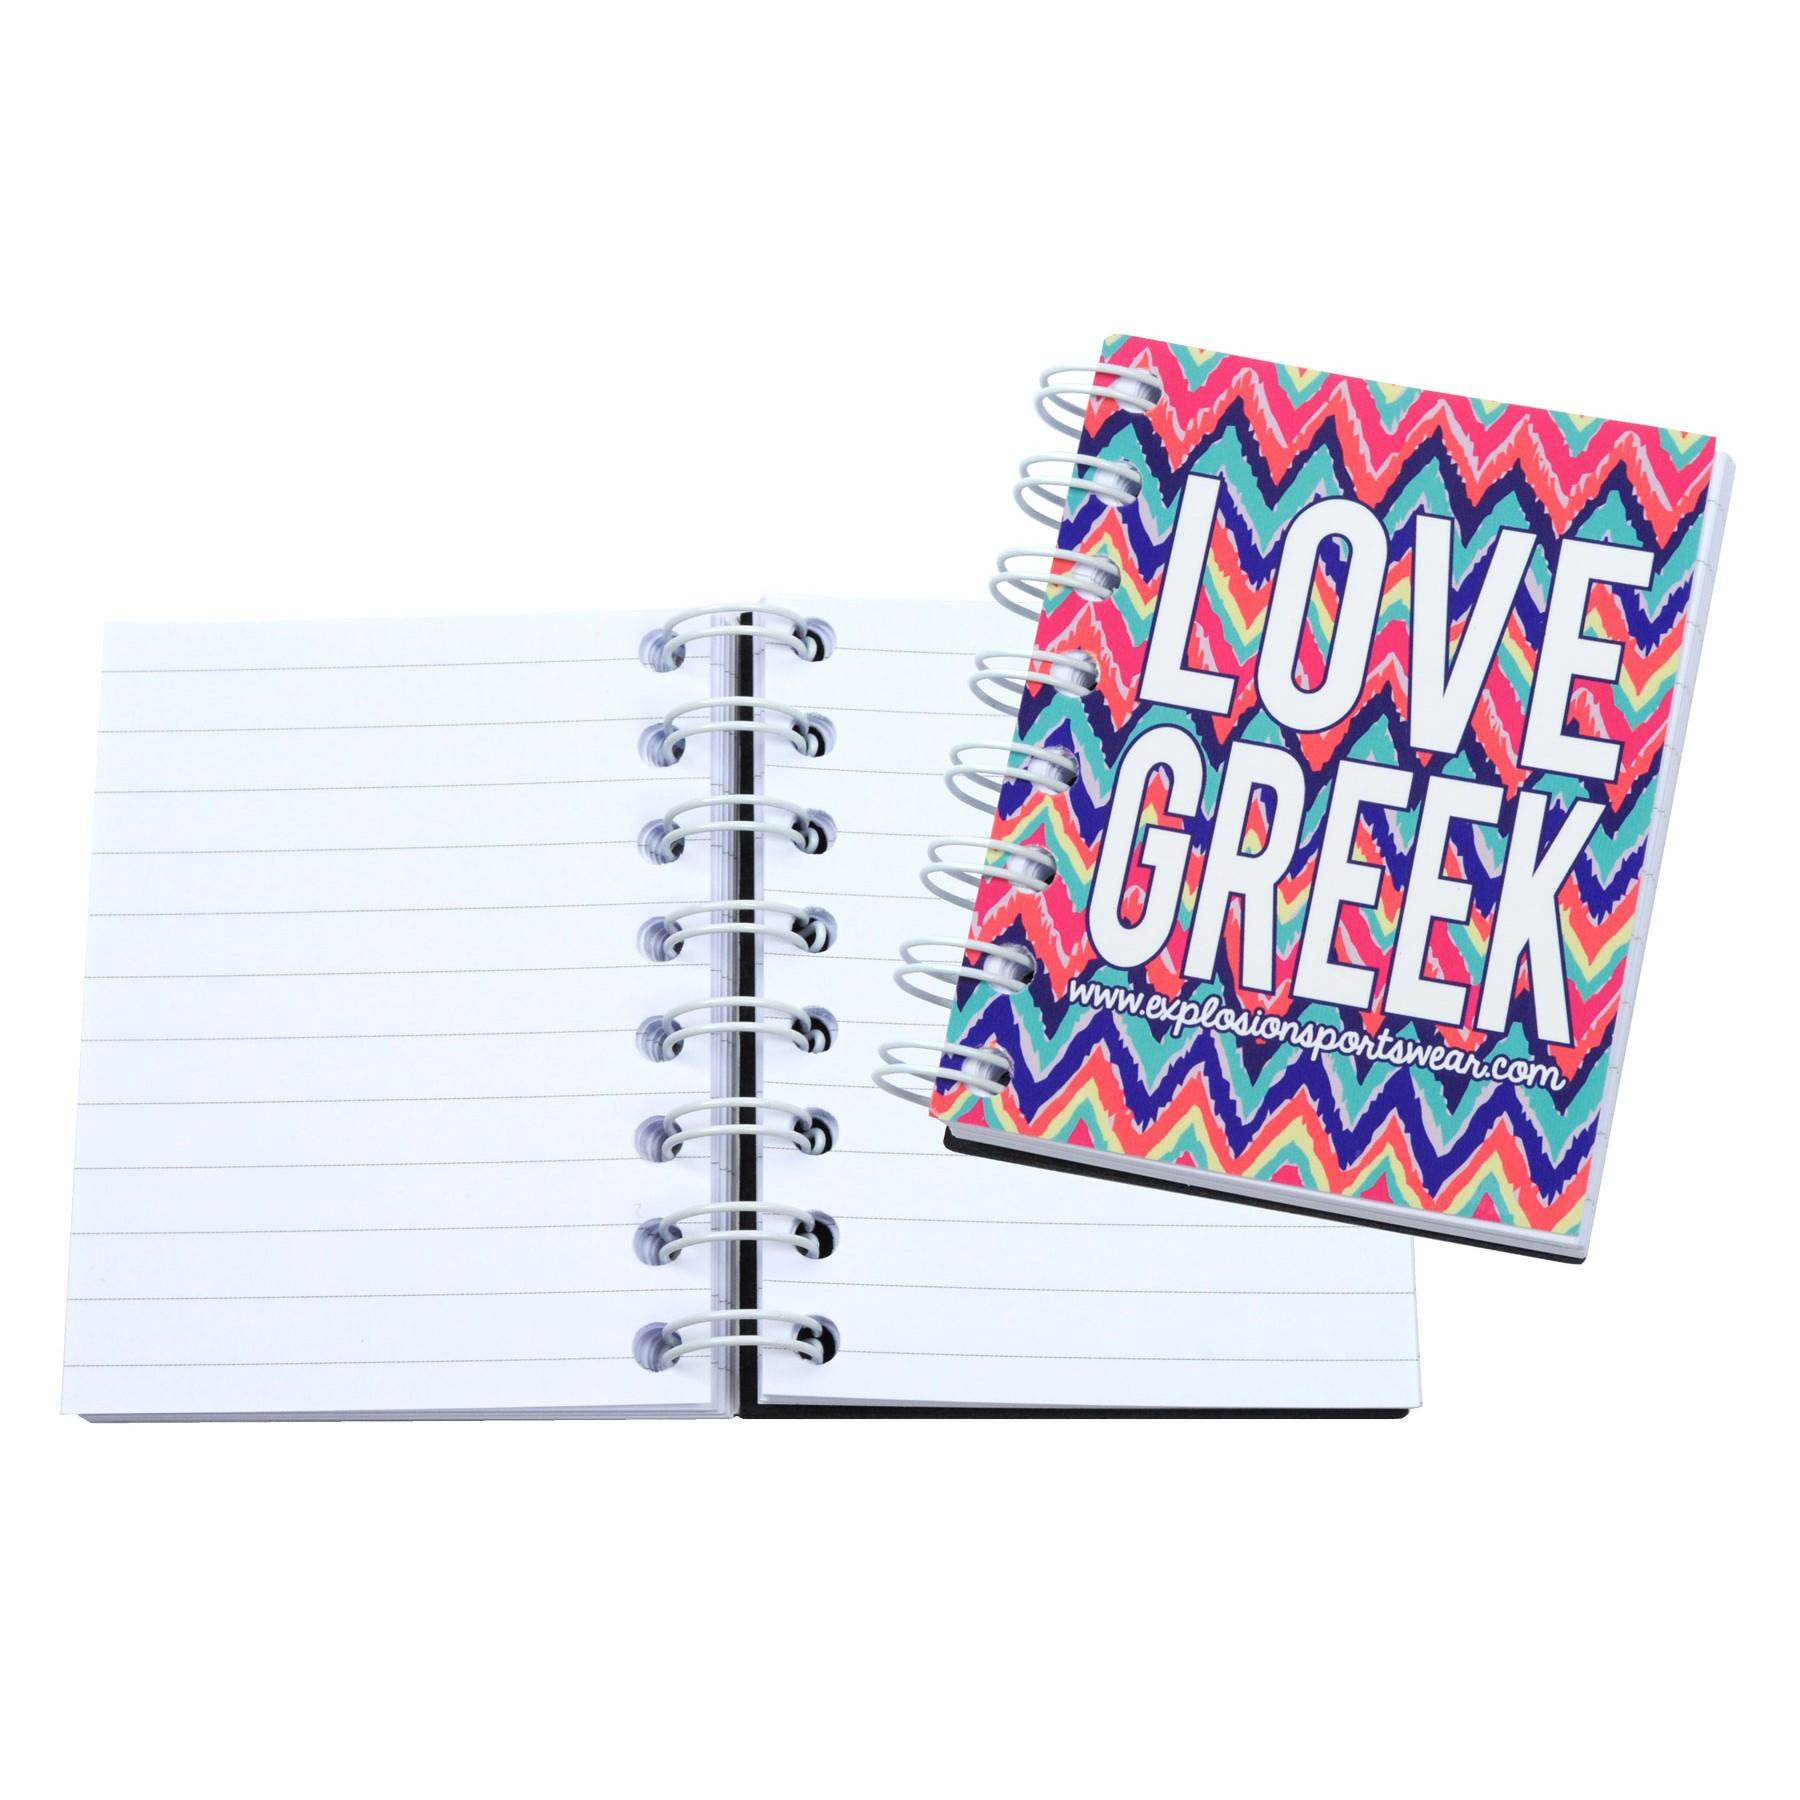 3 x 4 4 color process value spiral notebook journal branded